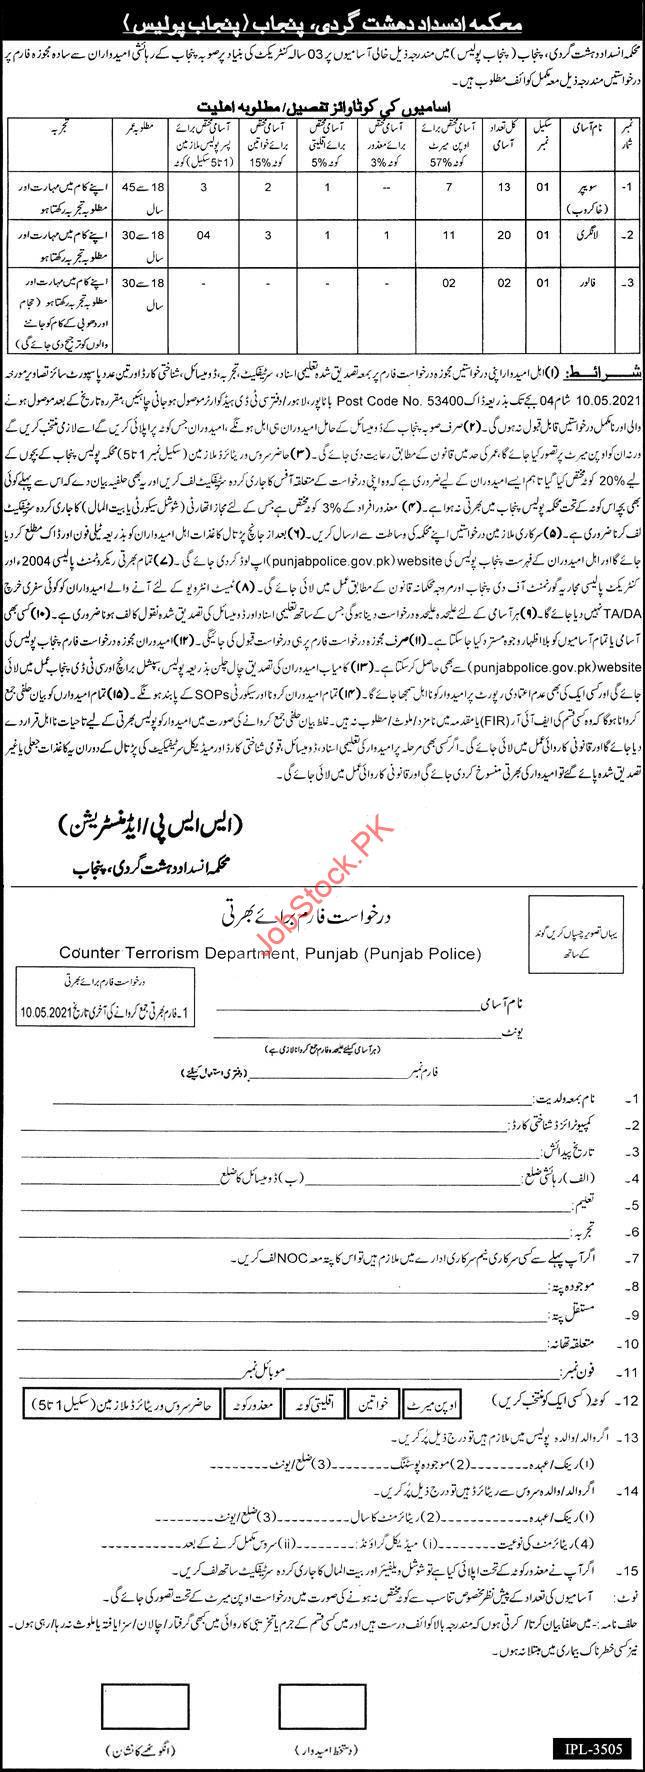 Counter Terrorism Department Ctd Punjab Police Jobs 2021